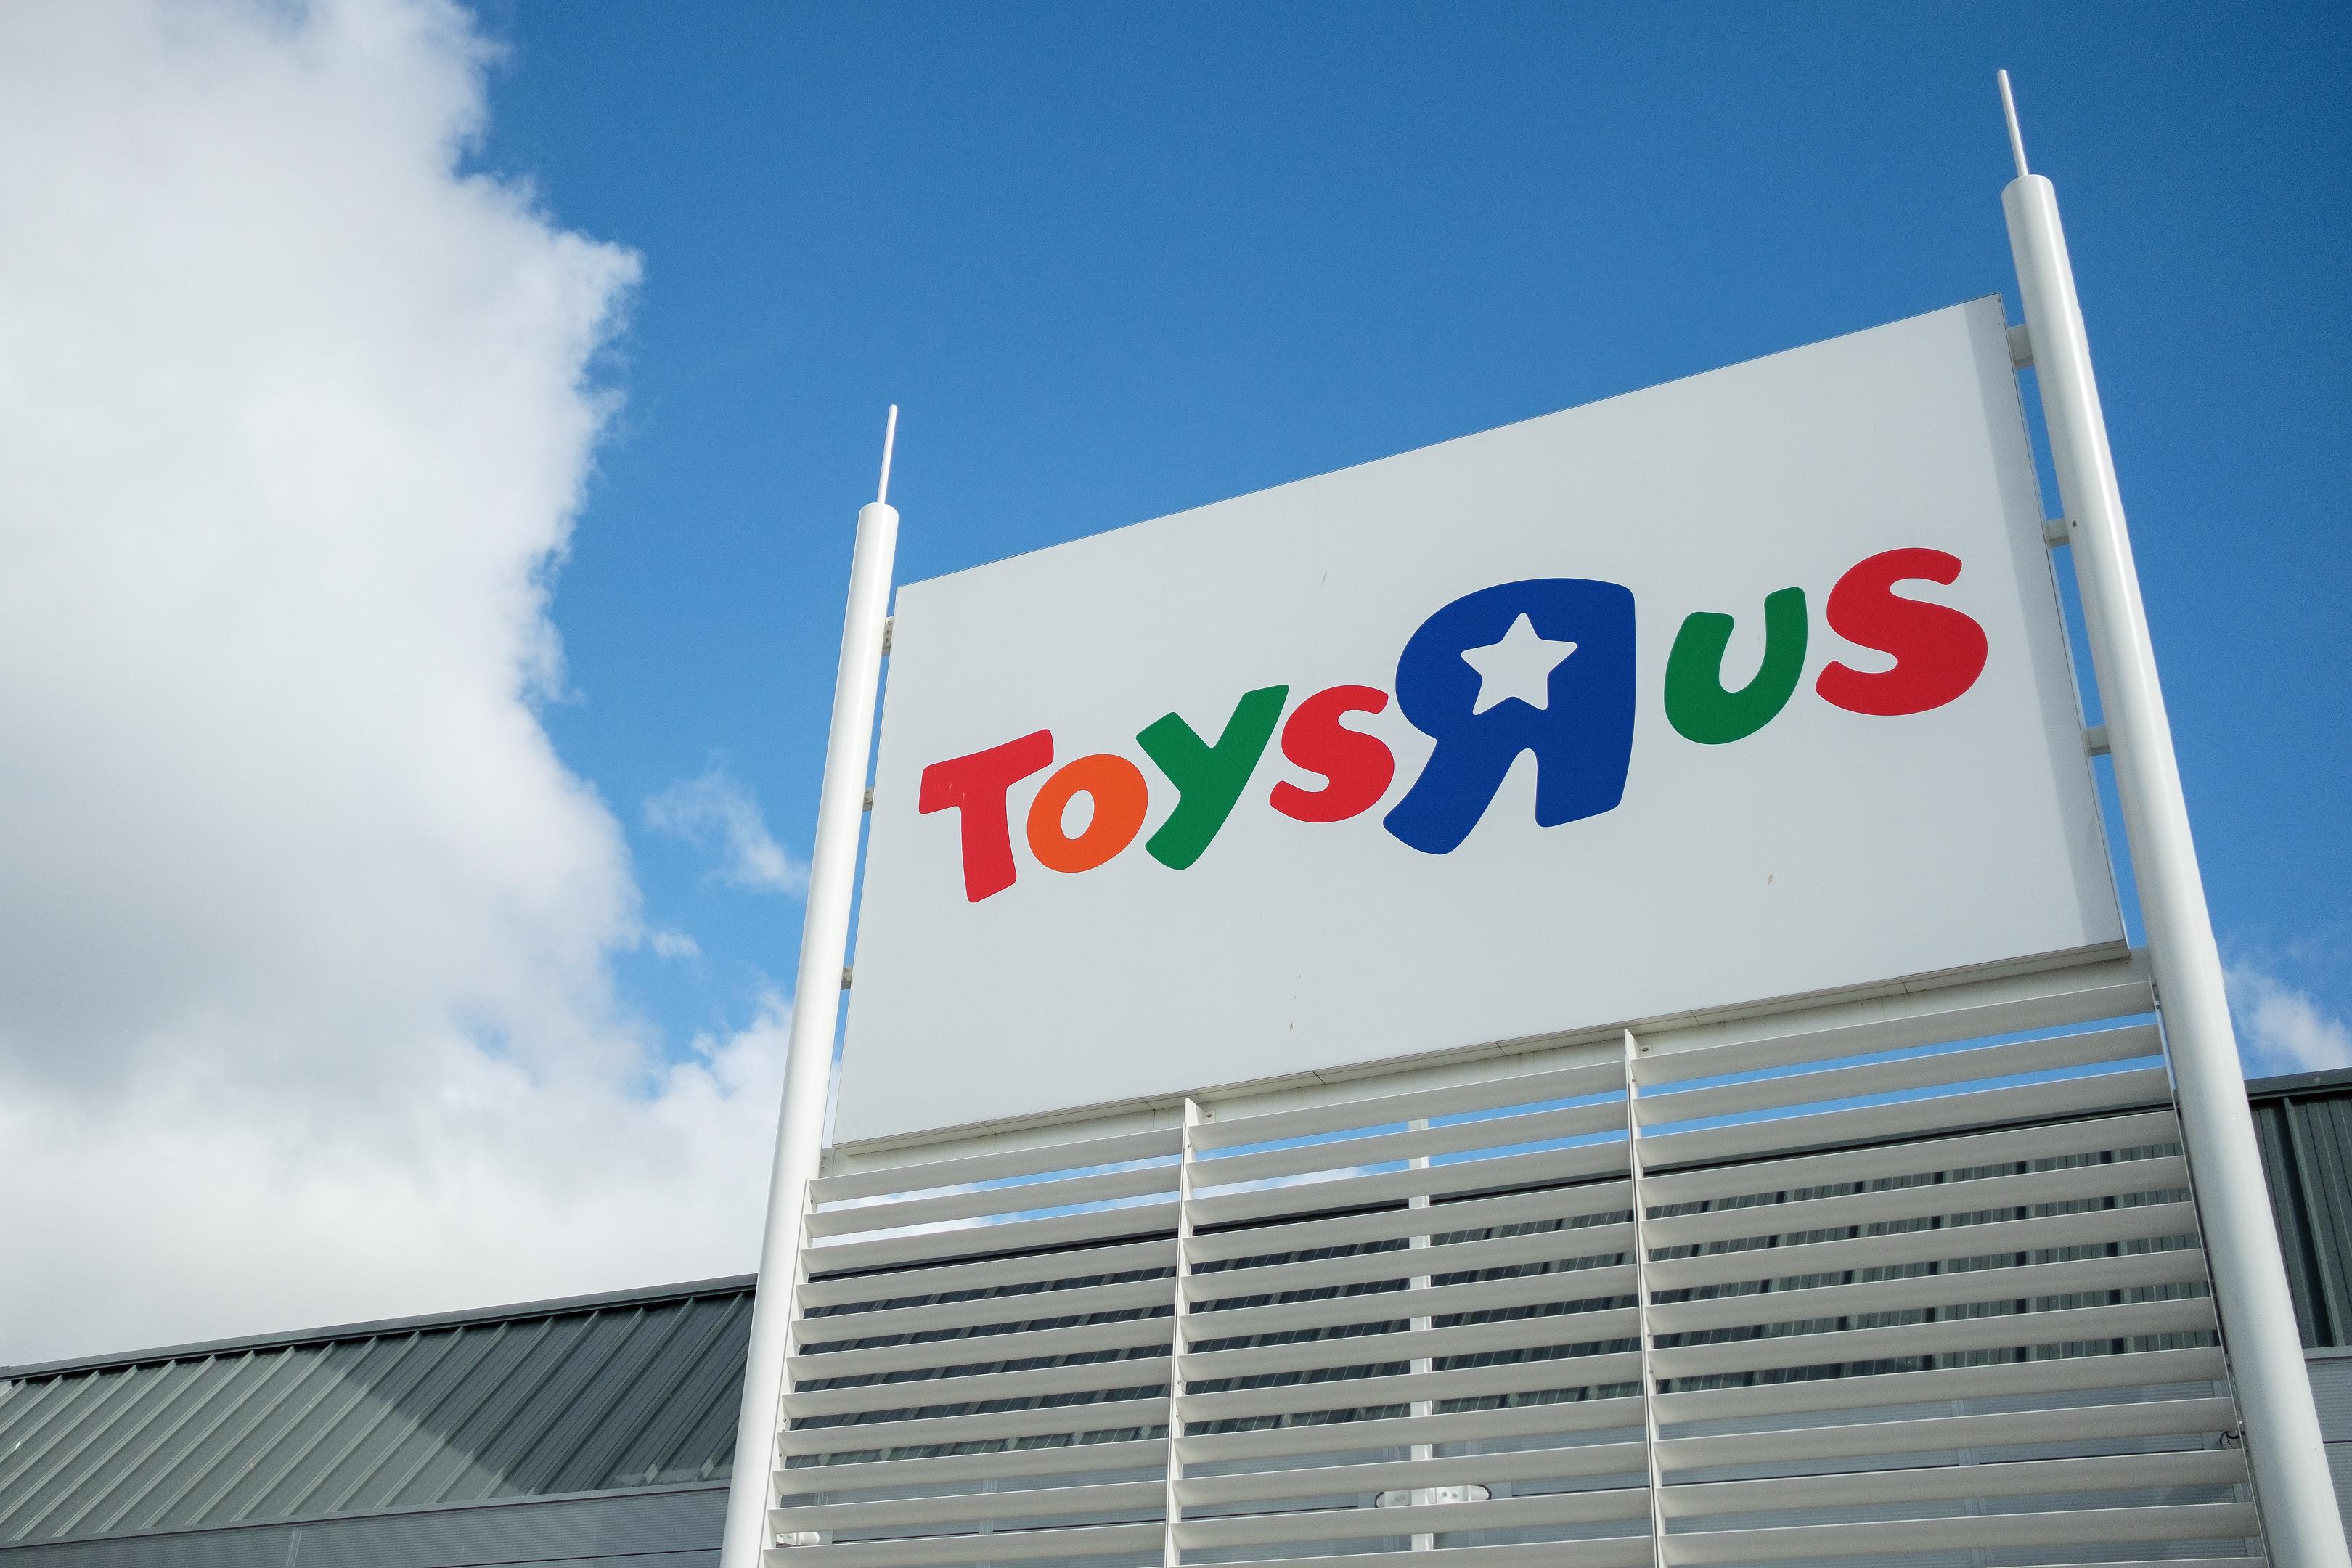 Toys R Us in Kirkcaldy